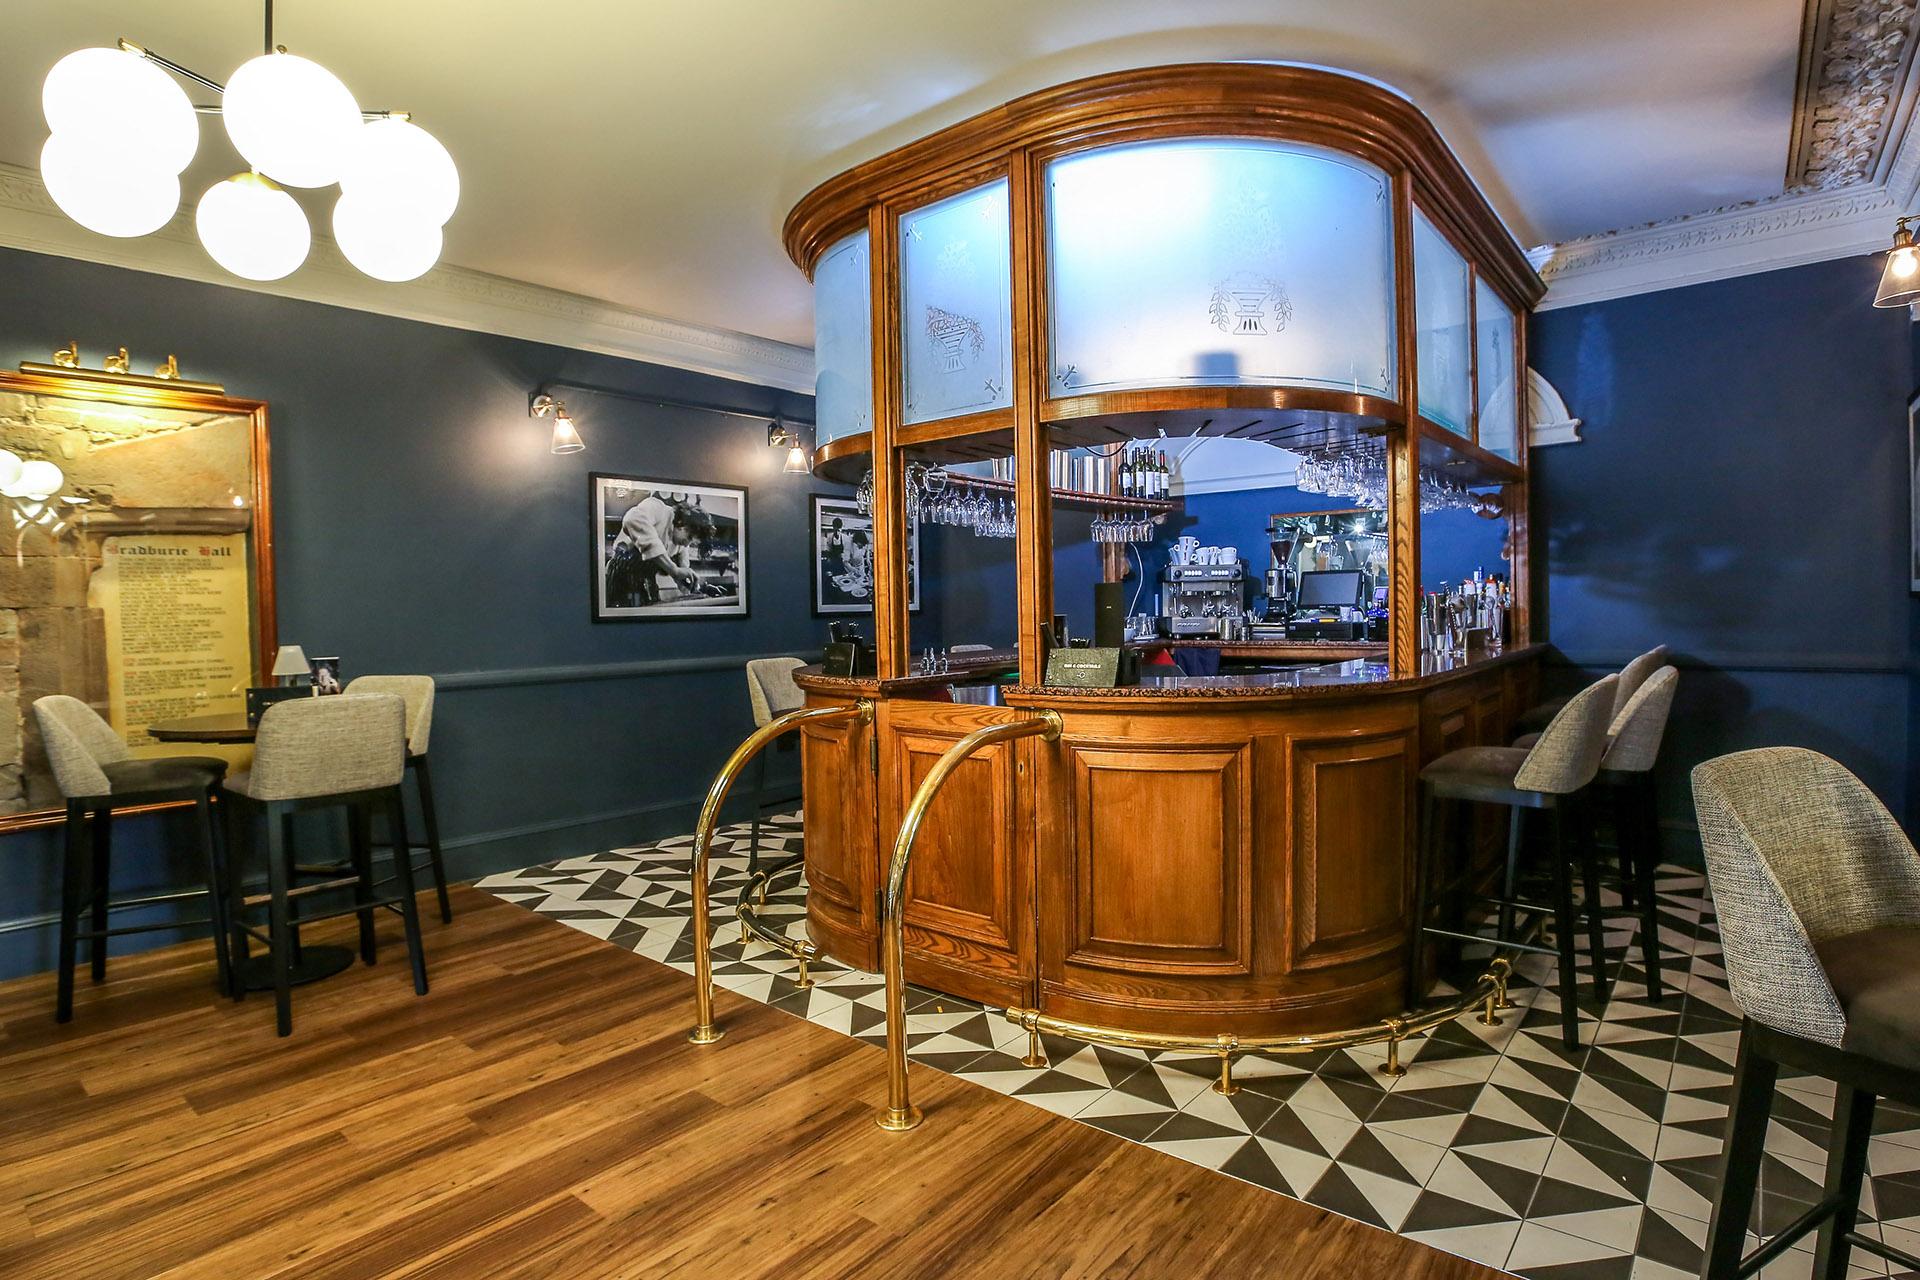 The bar at Bredbury Hall Stockport Cheshire